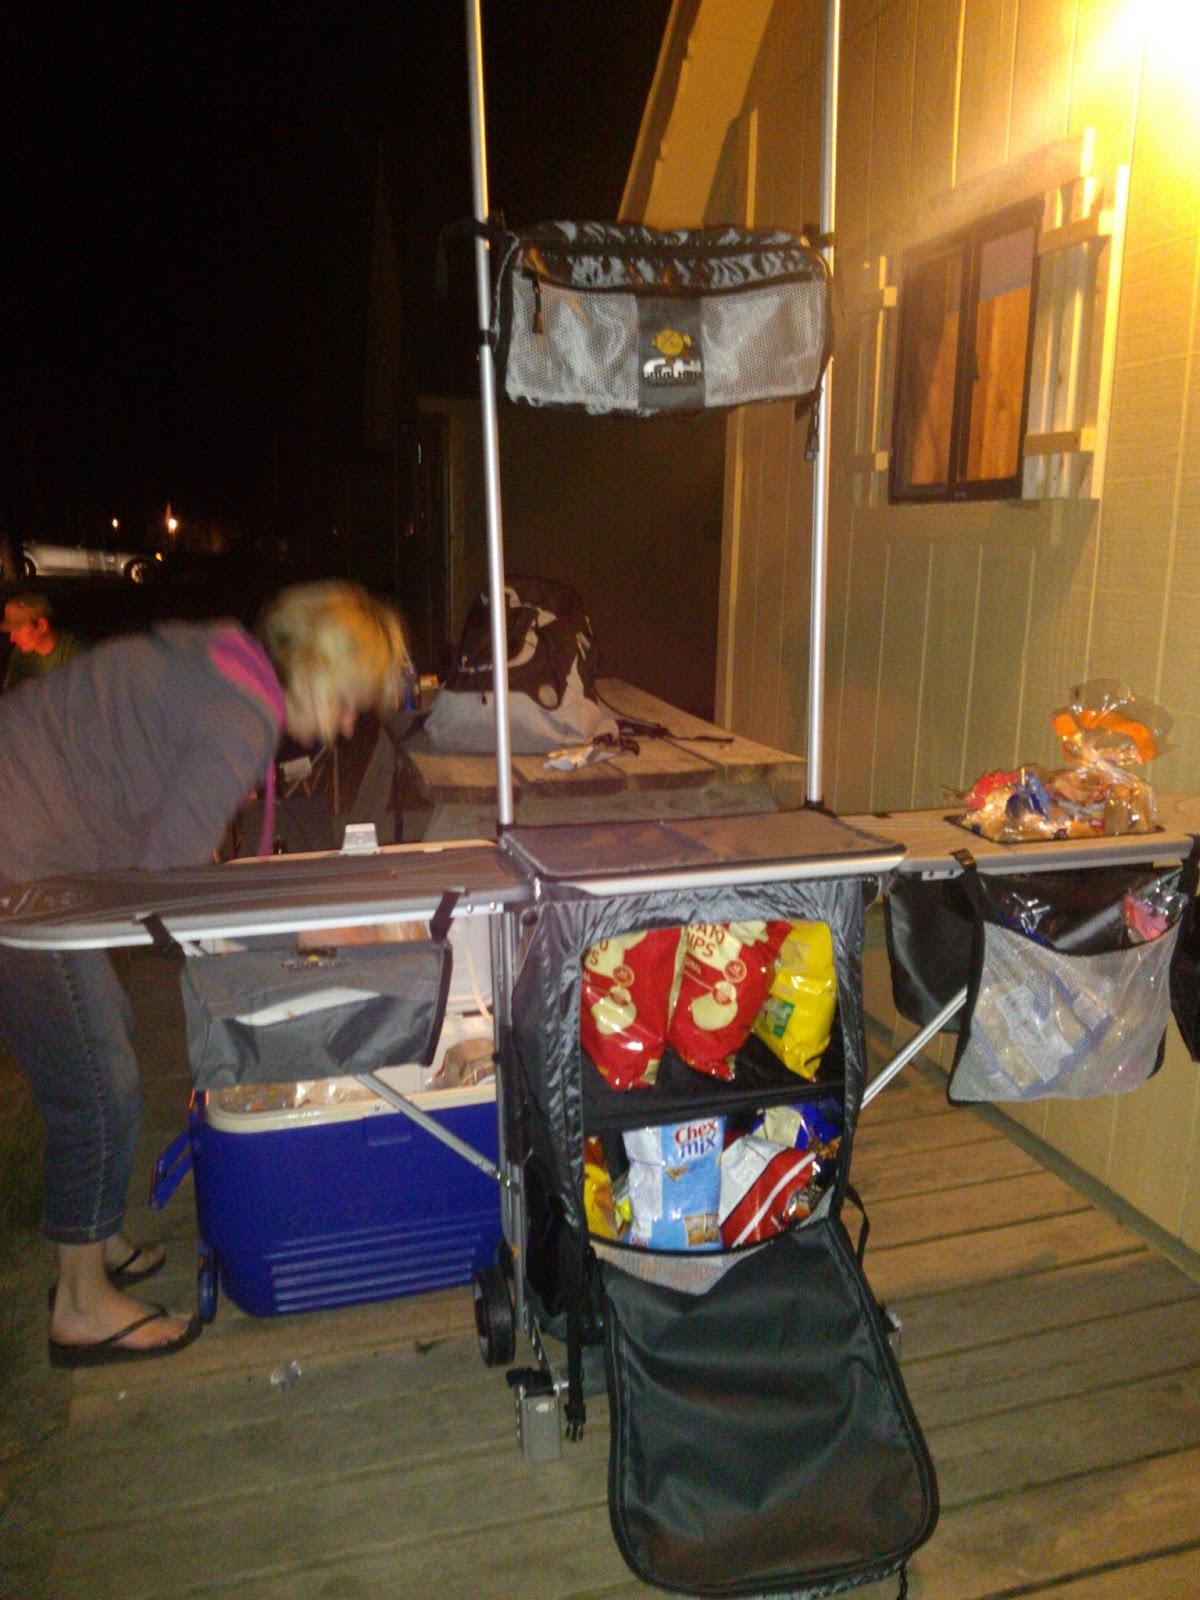 Grub Hub Camp Kitchen Review